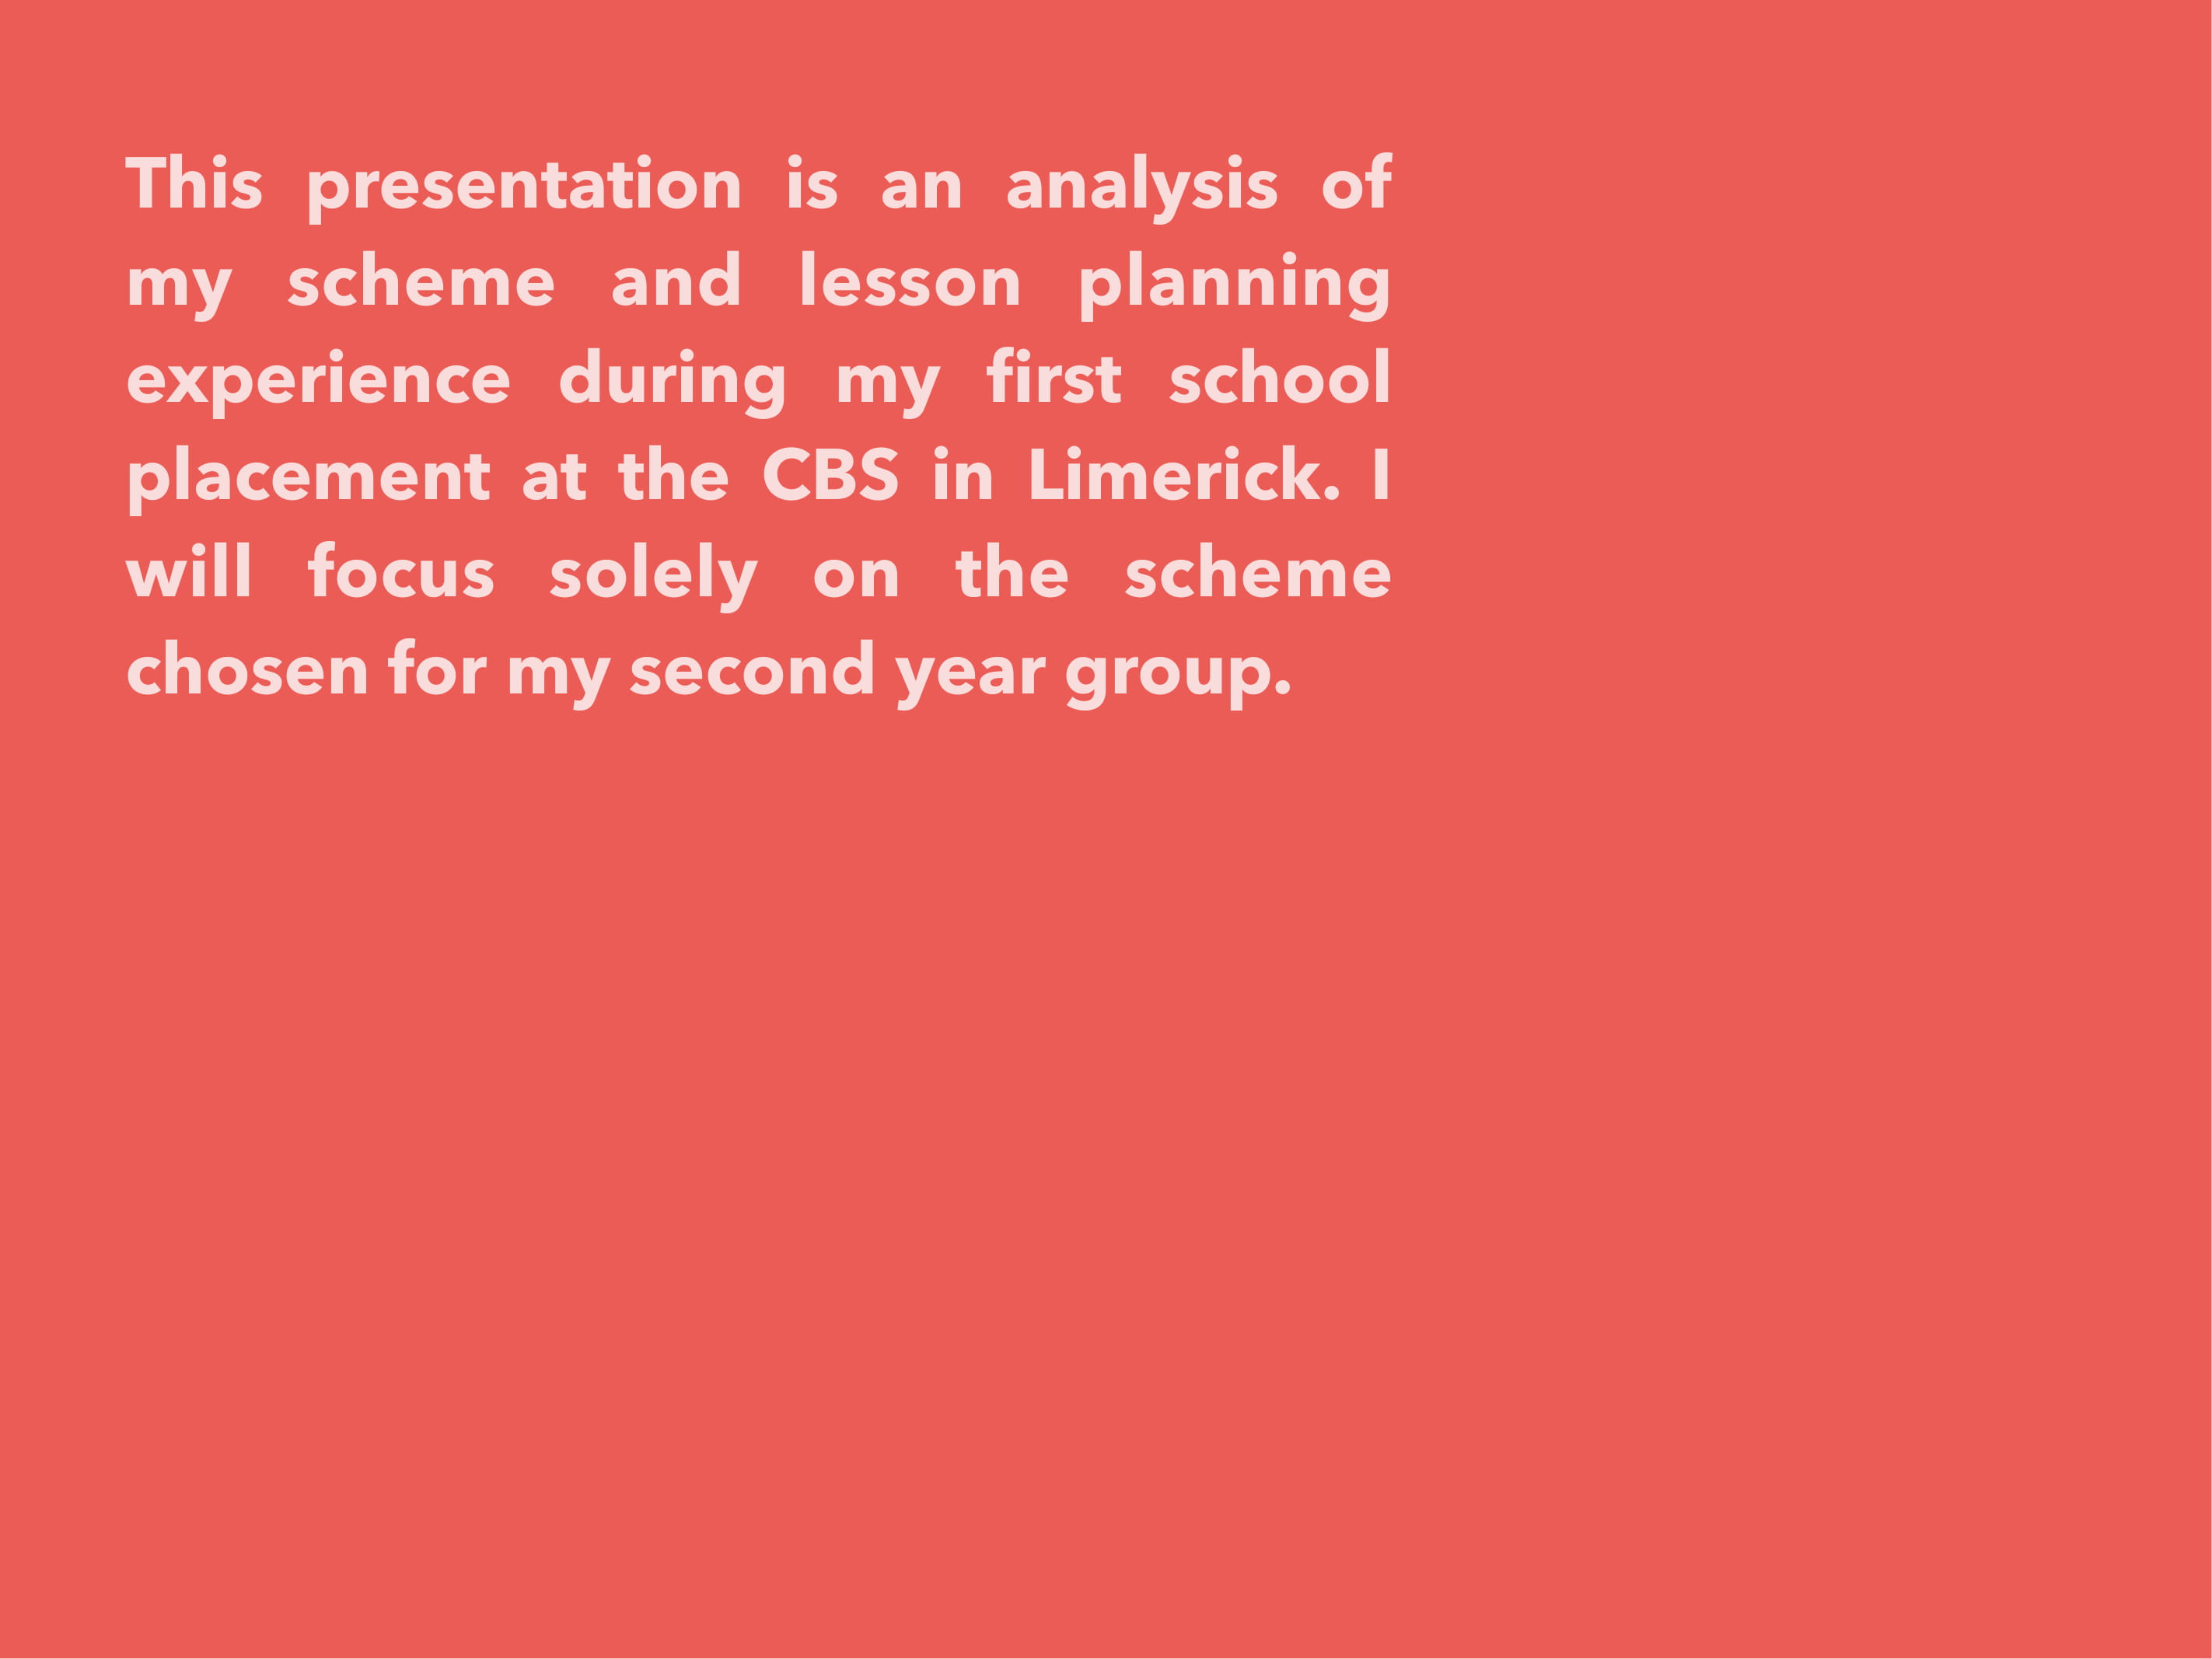 Niamh O'Toole Planning 2017-02